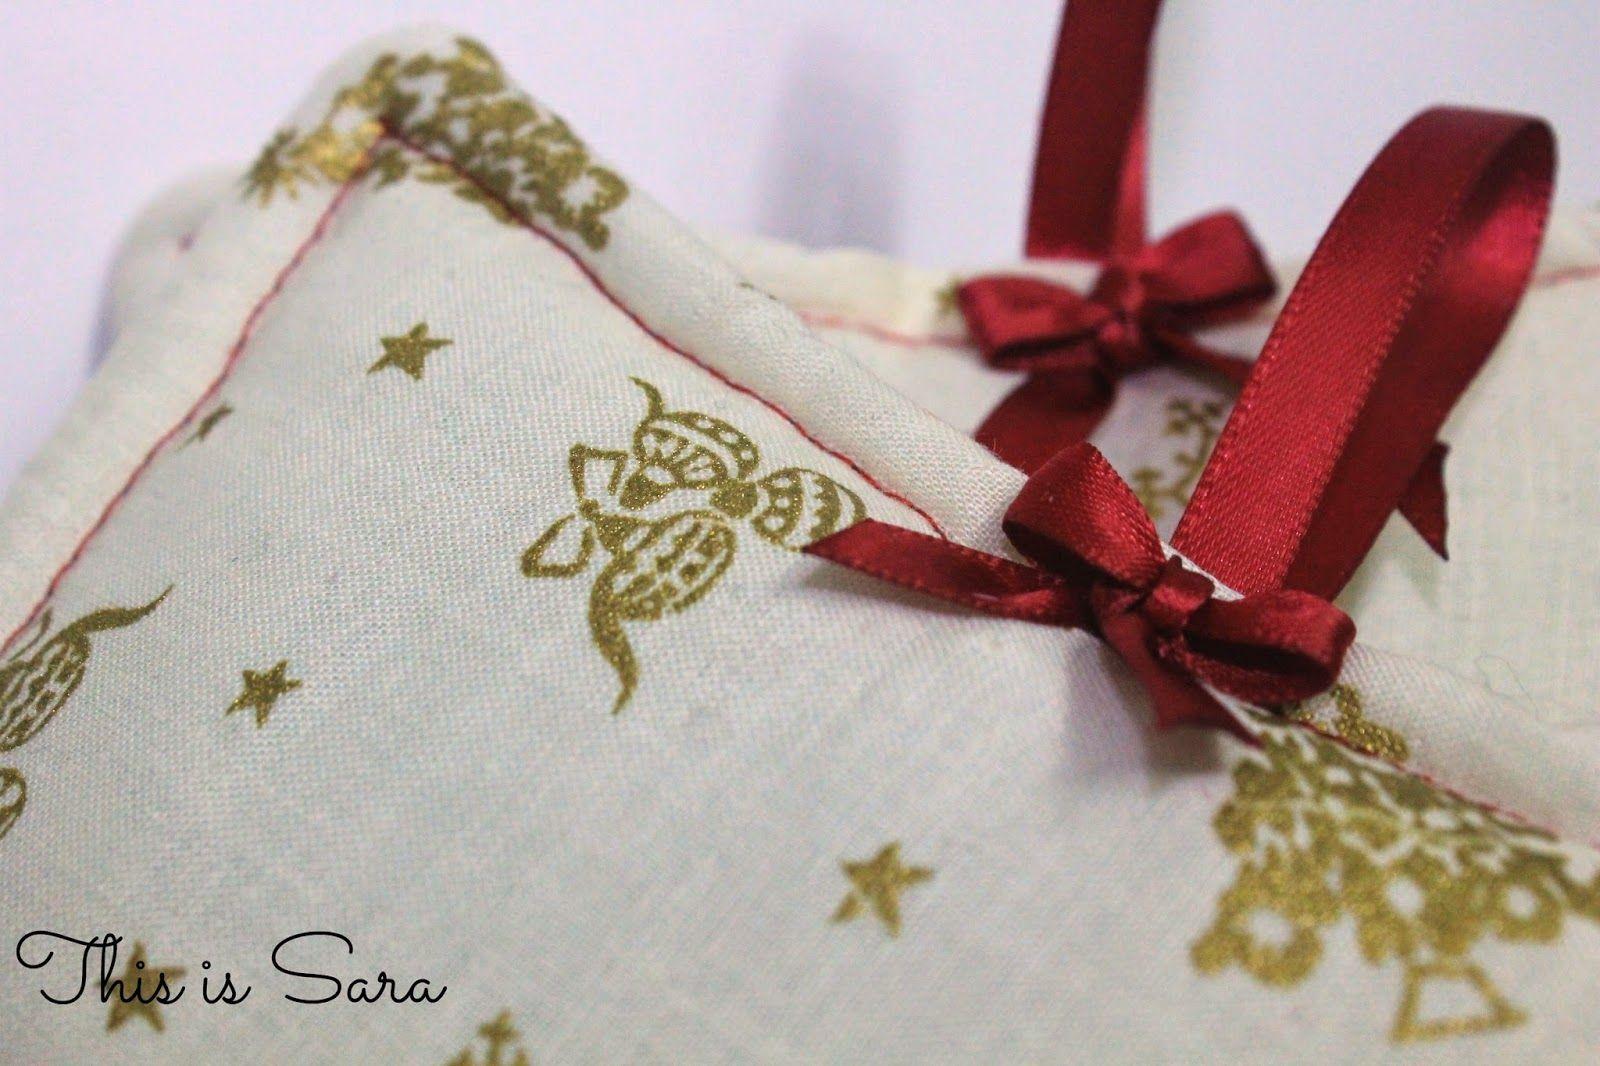 Handmade Xmas gifts